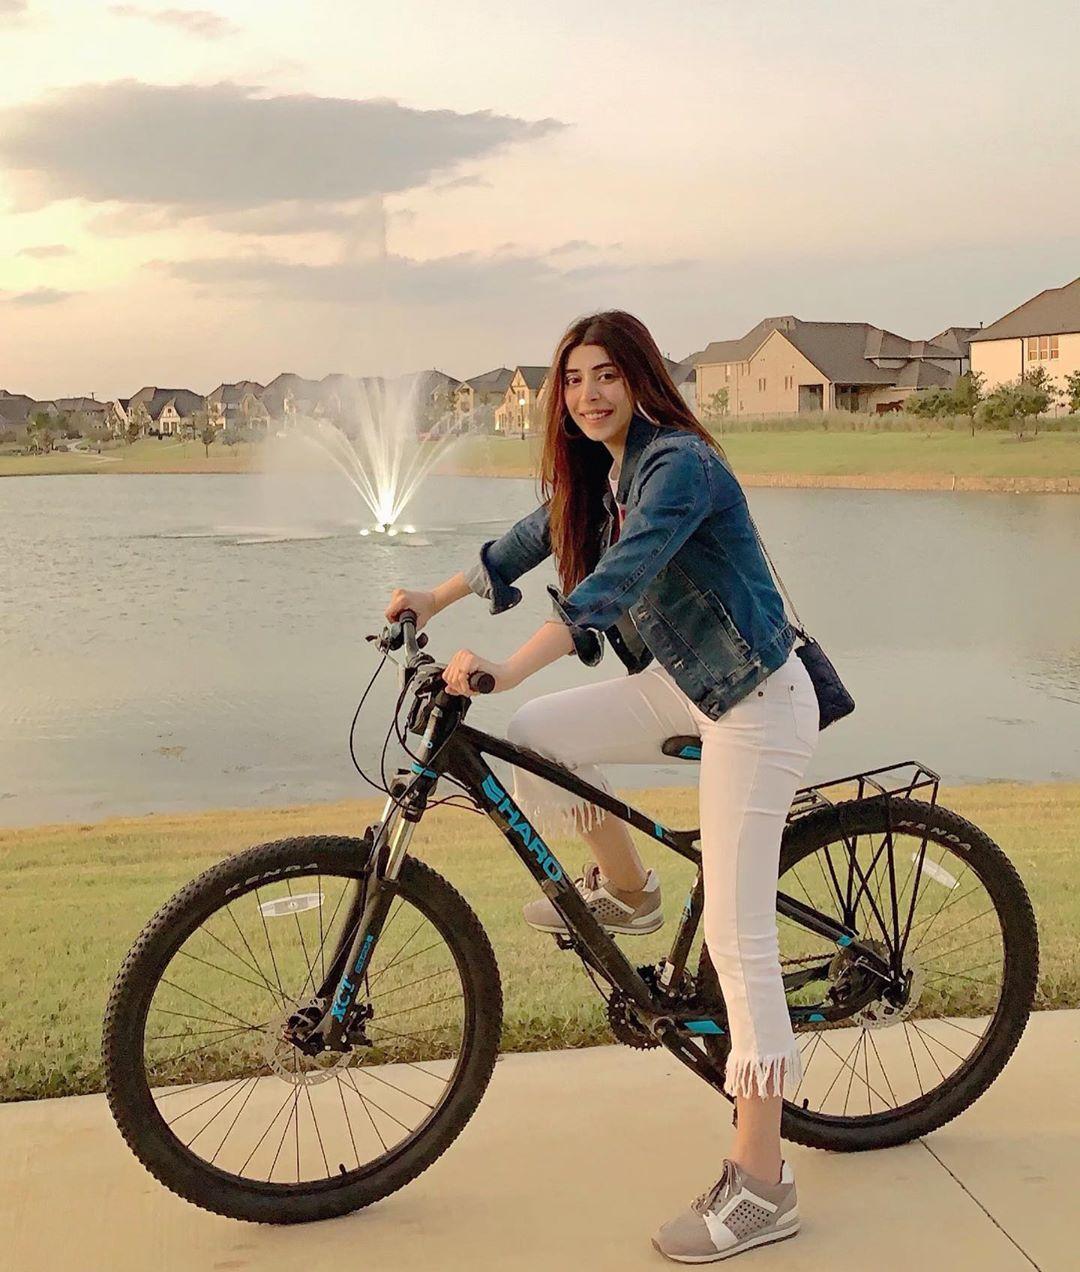 Latest Clicks of Actress Urwa Hocane from Texas USA